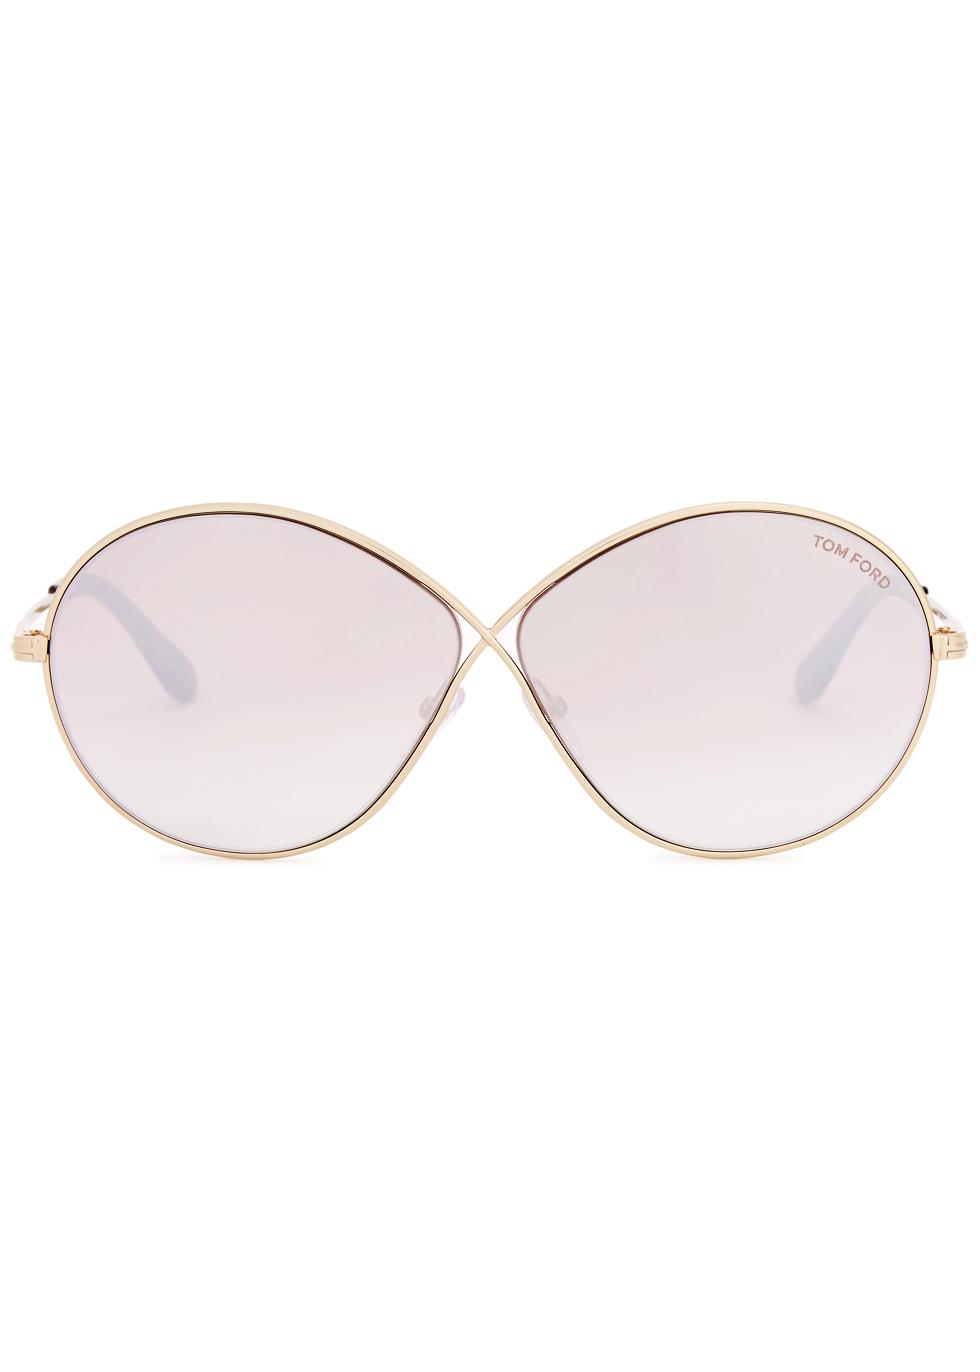 Rania mirrored gold tone sunglasses - Tom Ford Eyewear